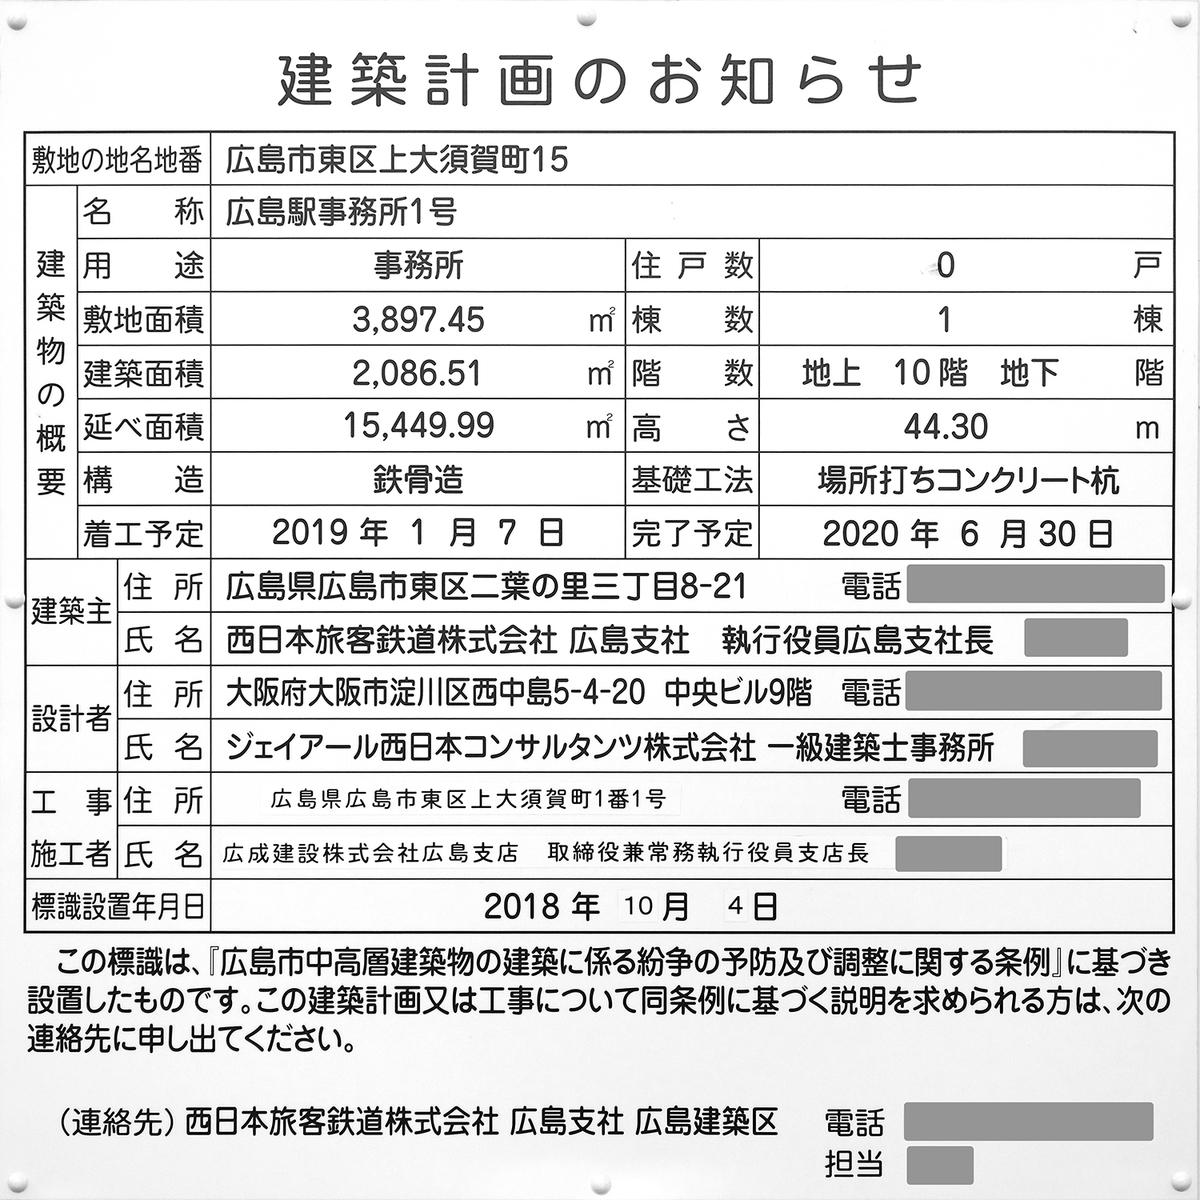 JR西日本広島支社